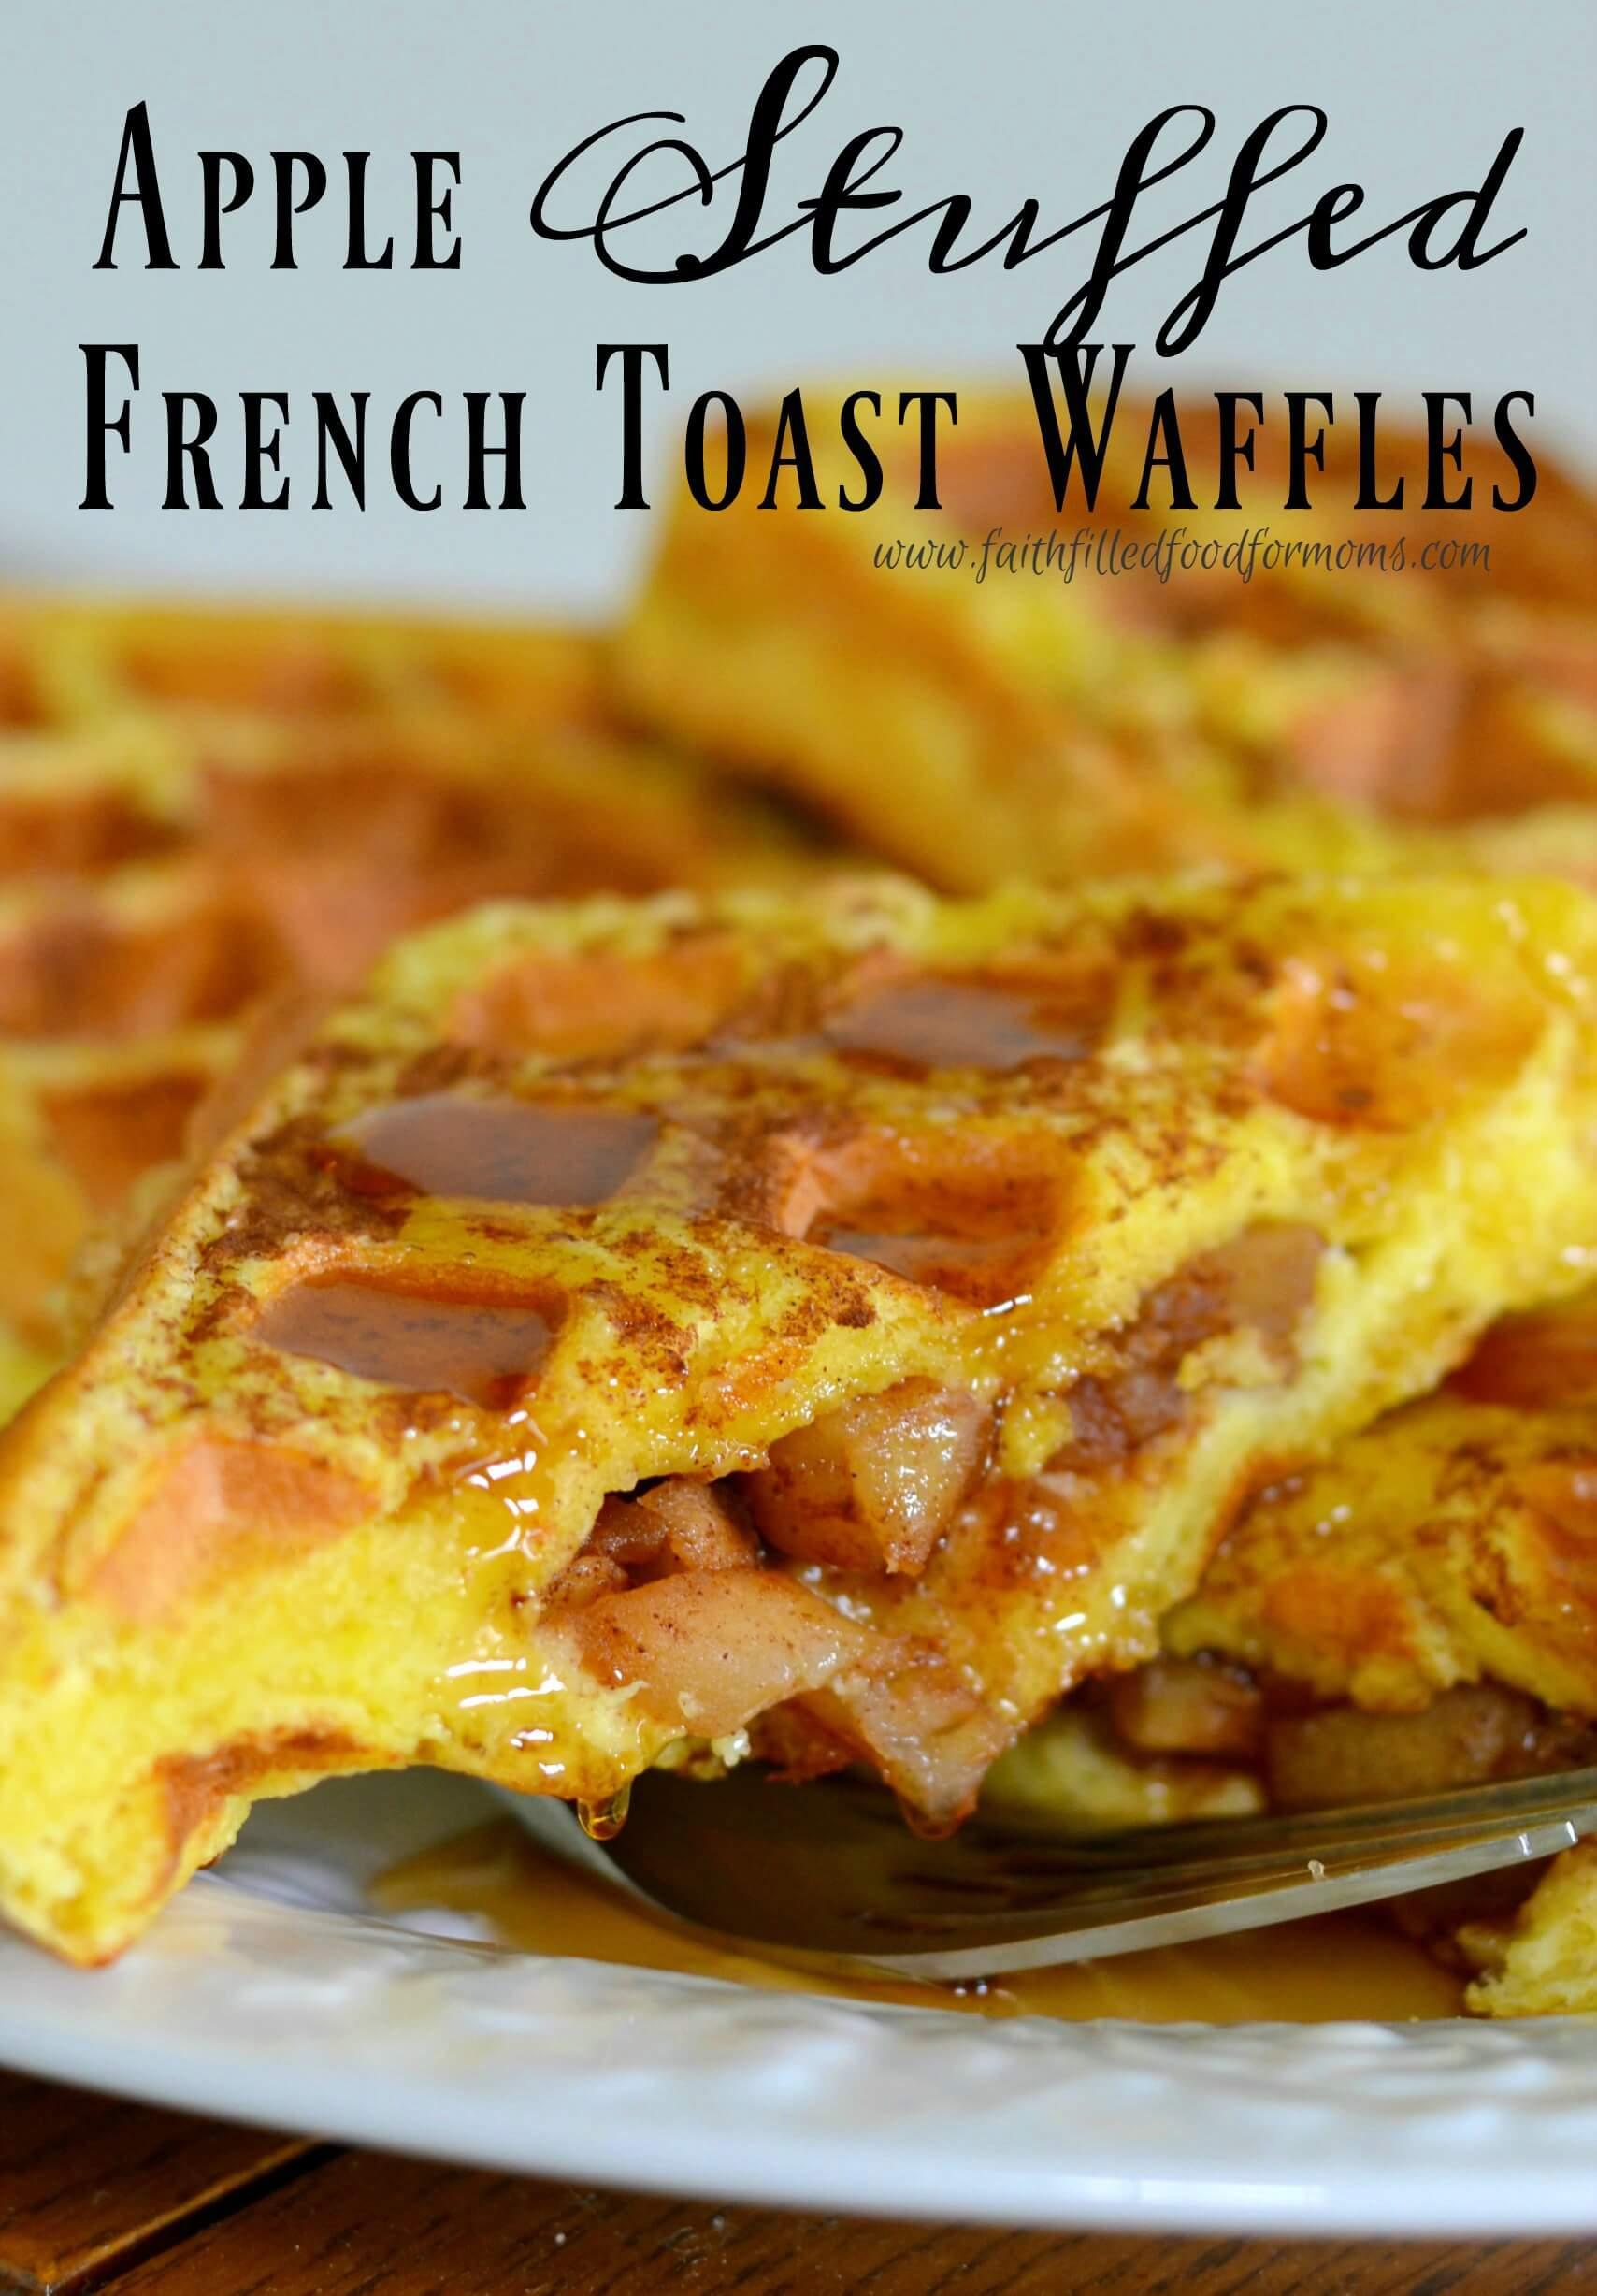 apple-stuffed-french-toast-waffles-yum | Serendipity and ...